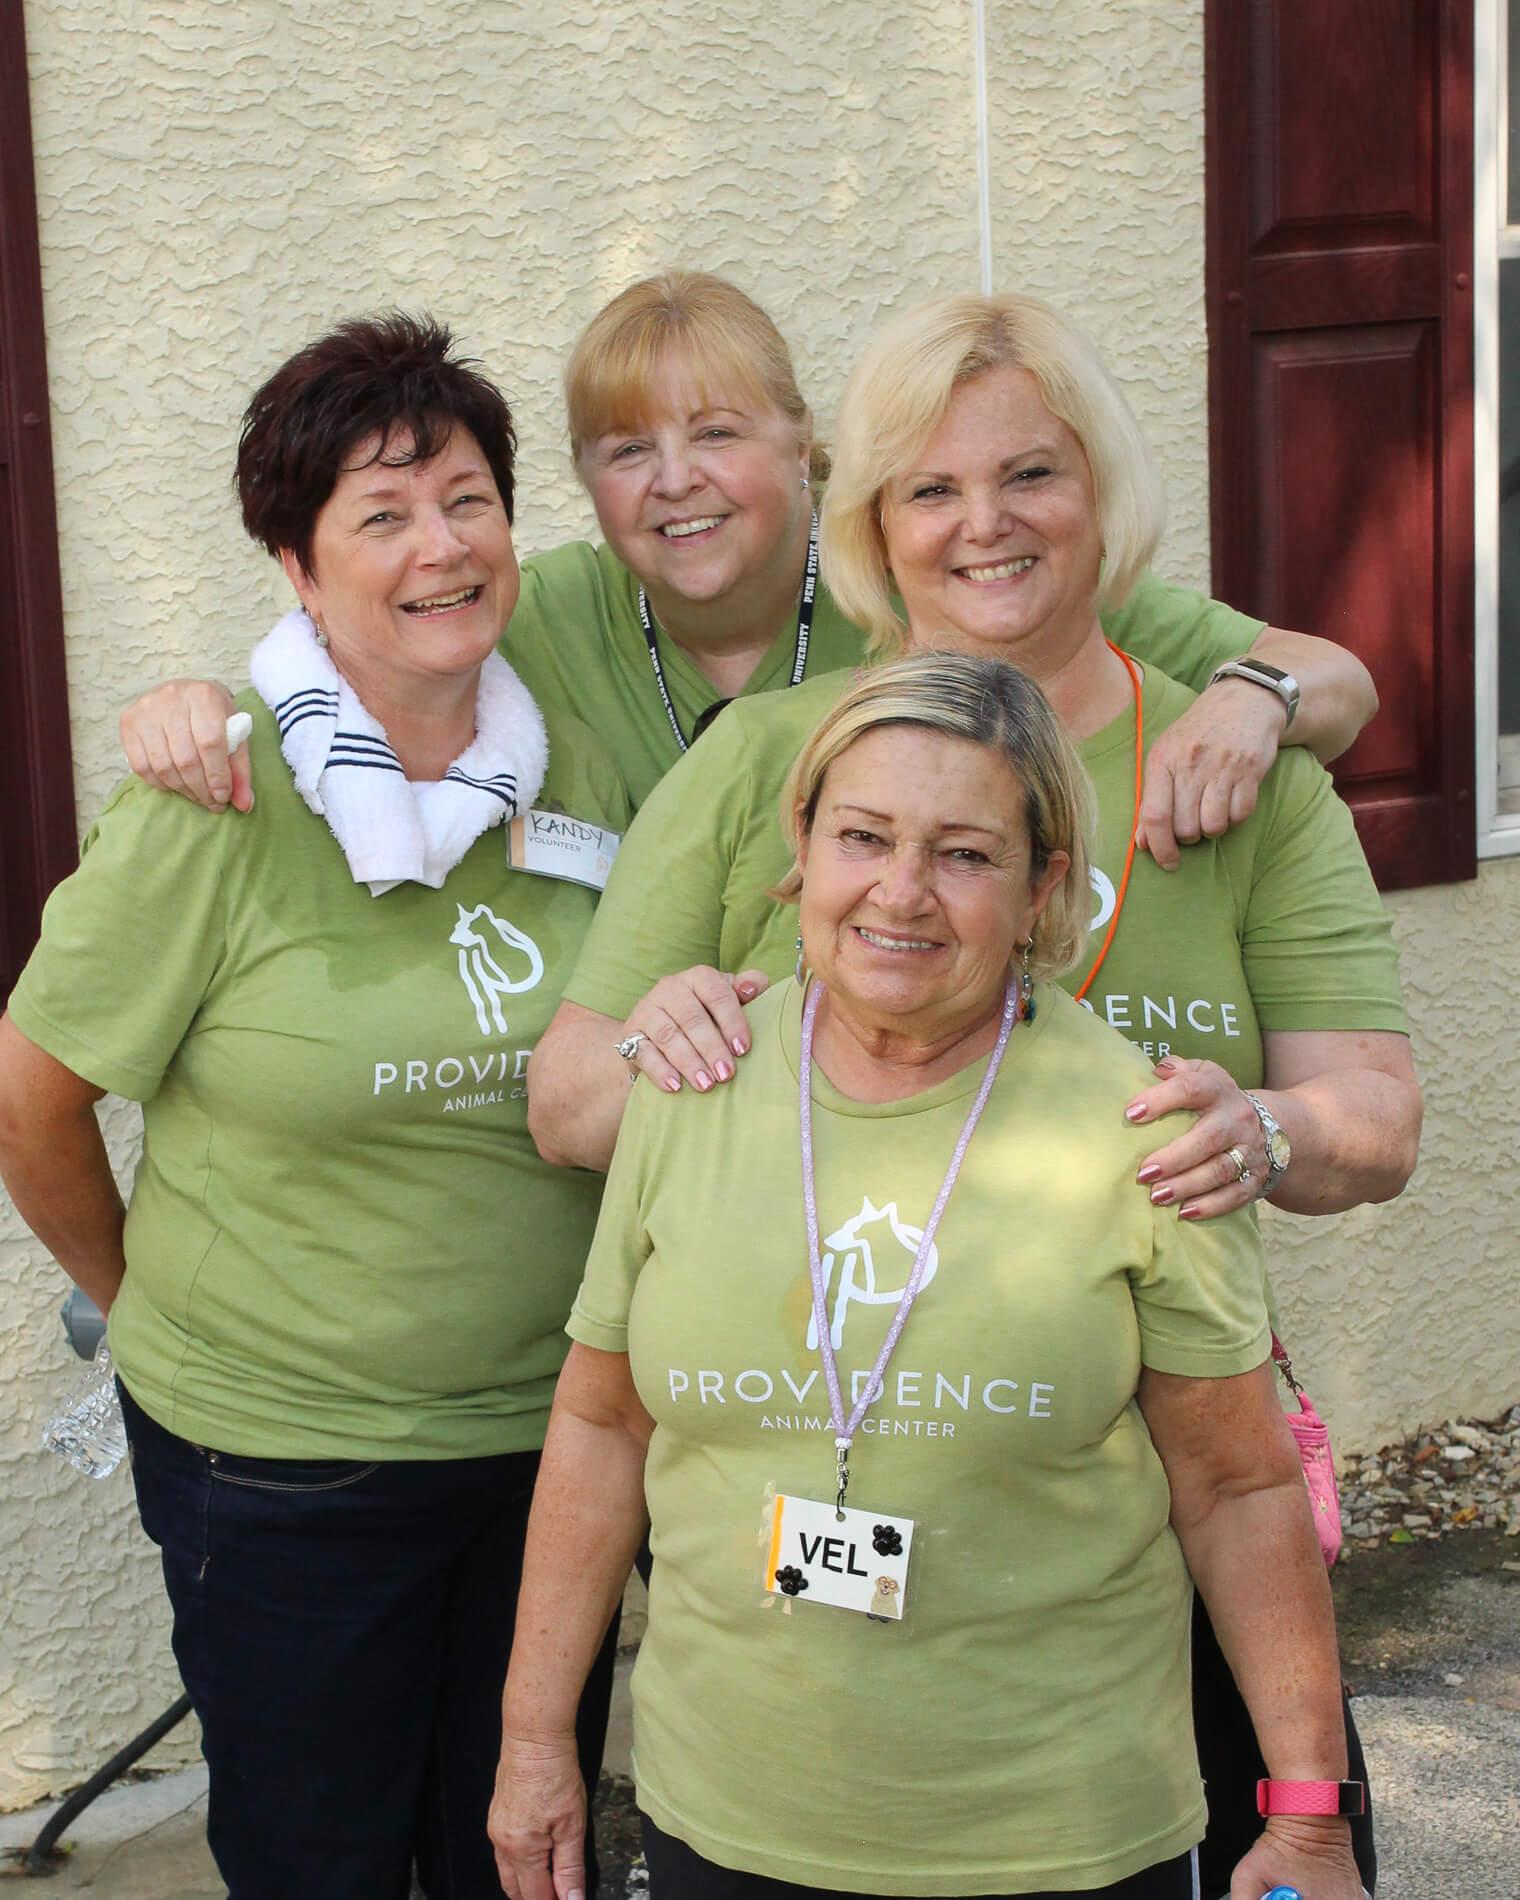 Providence Animal Center volunteers